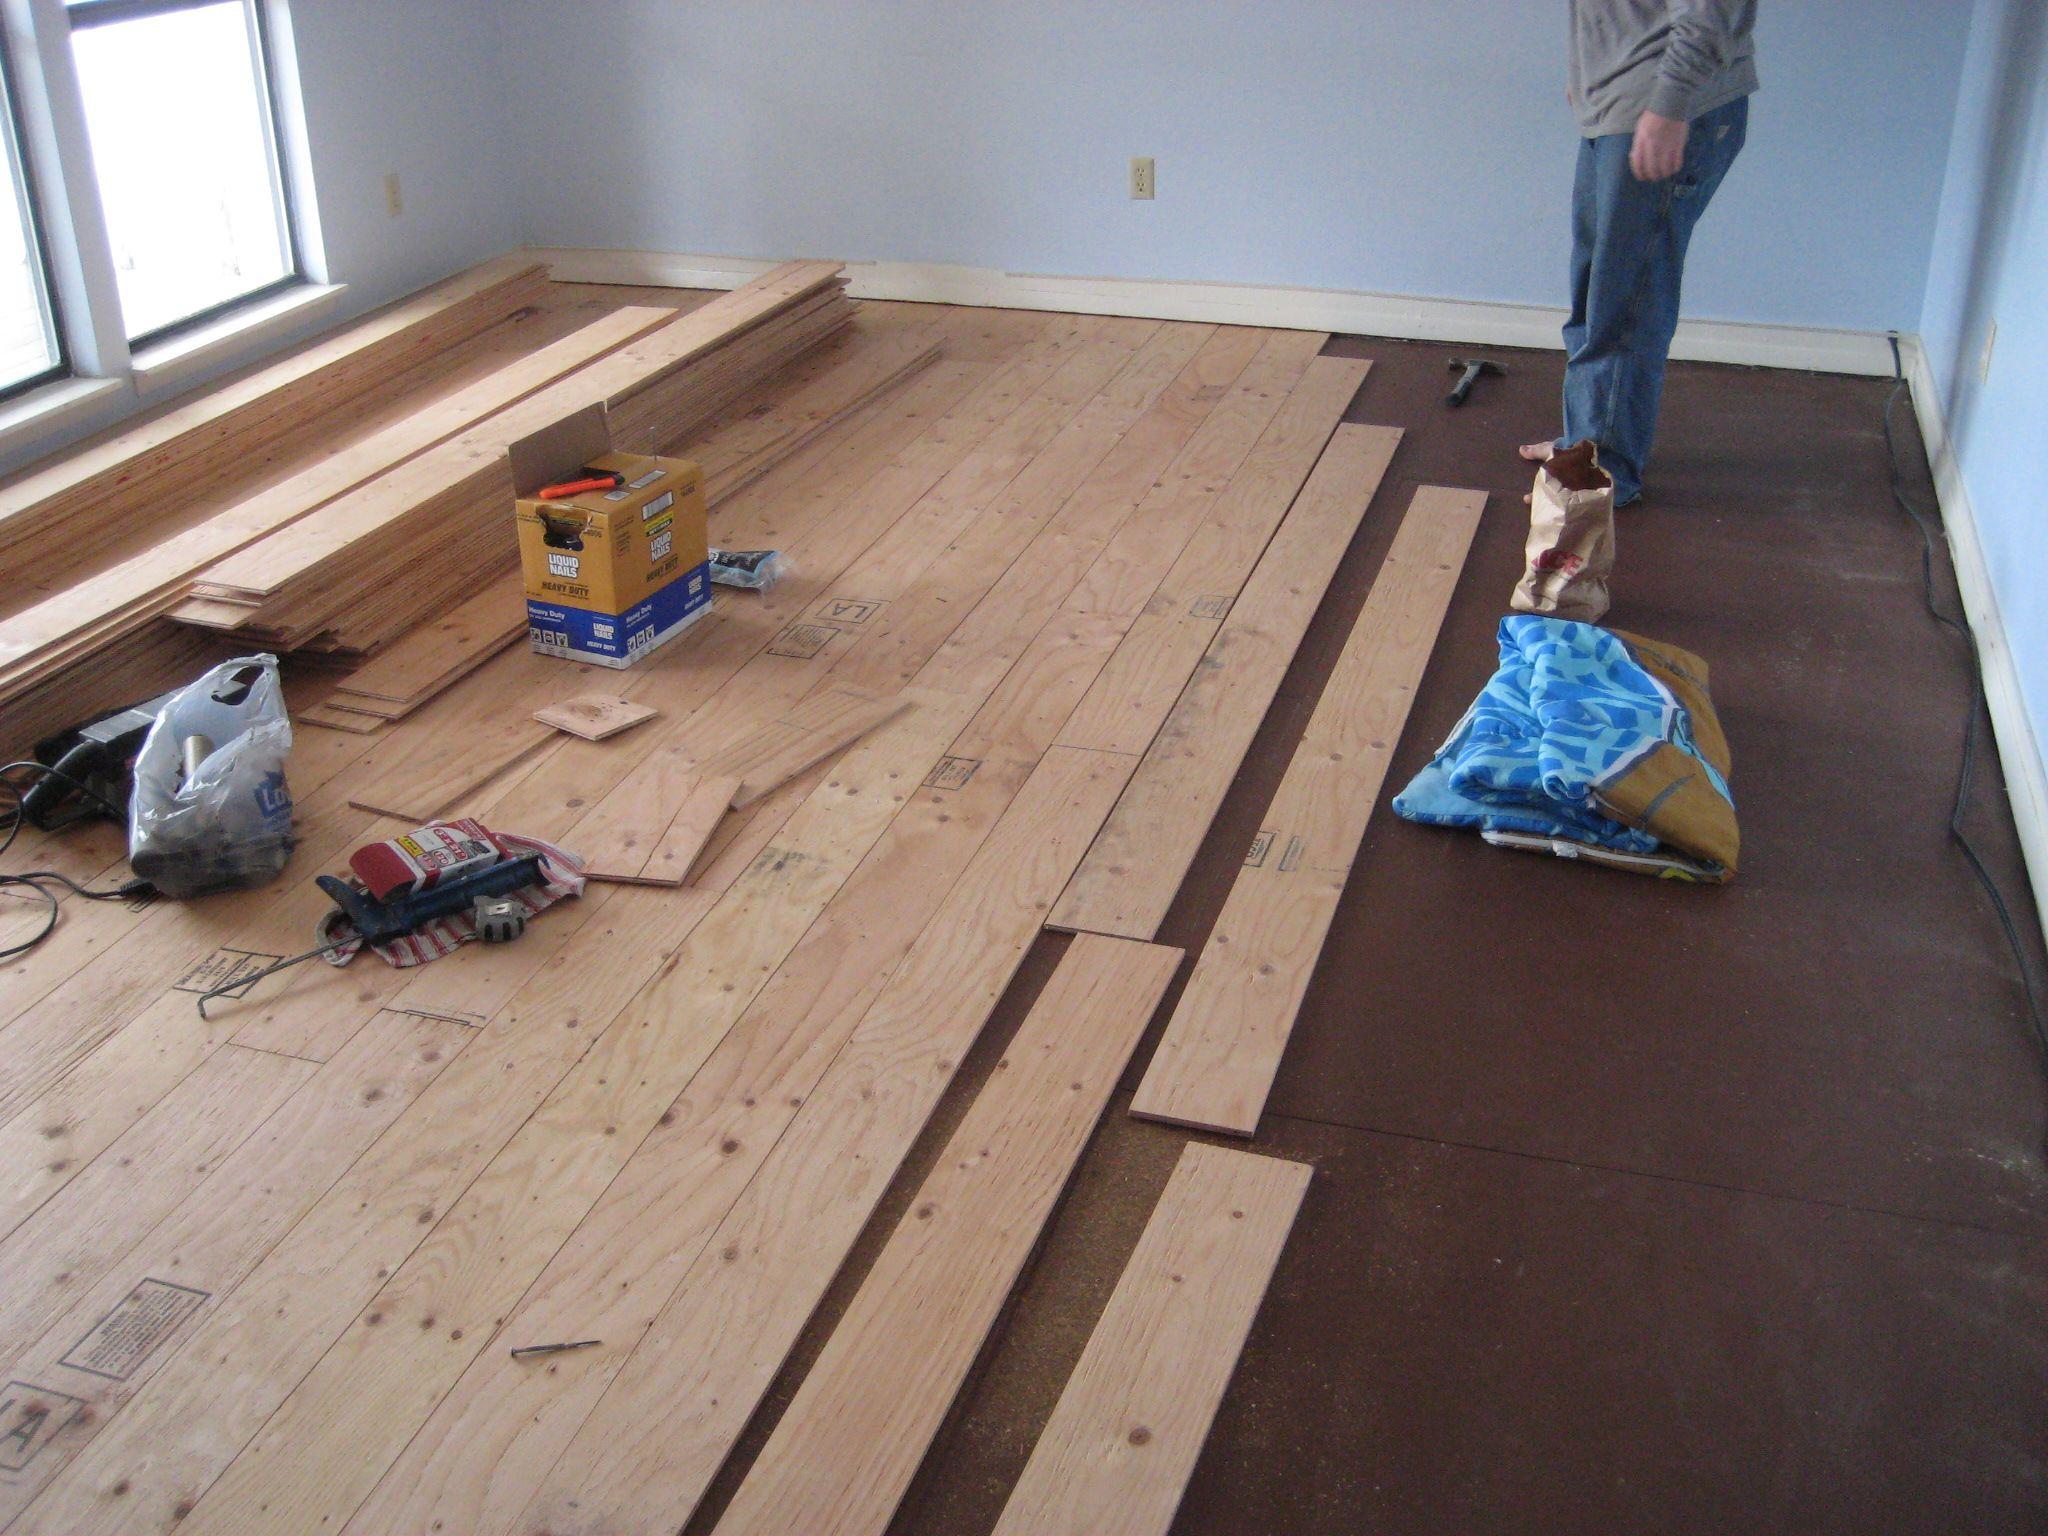 Real Wood Floors Made From Plywood Diy Wood Floors Diy